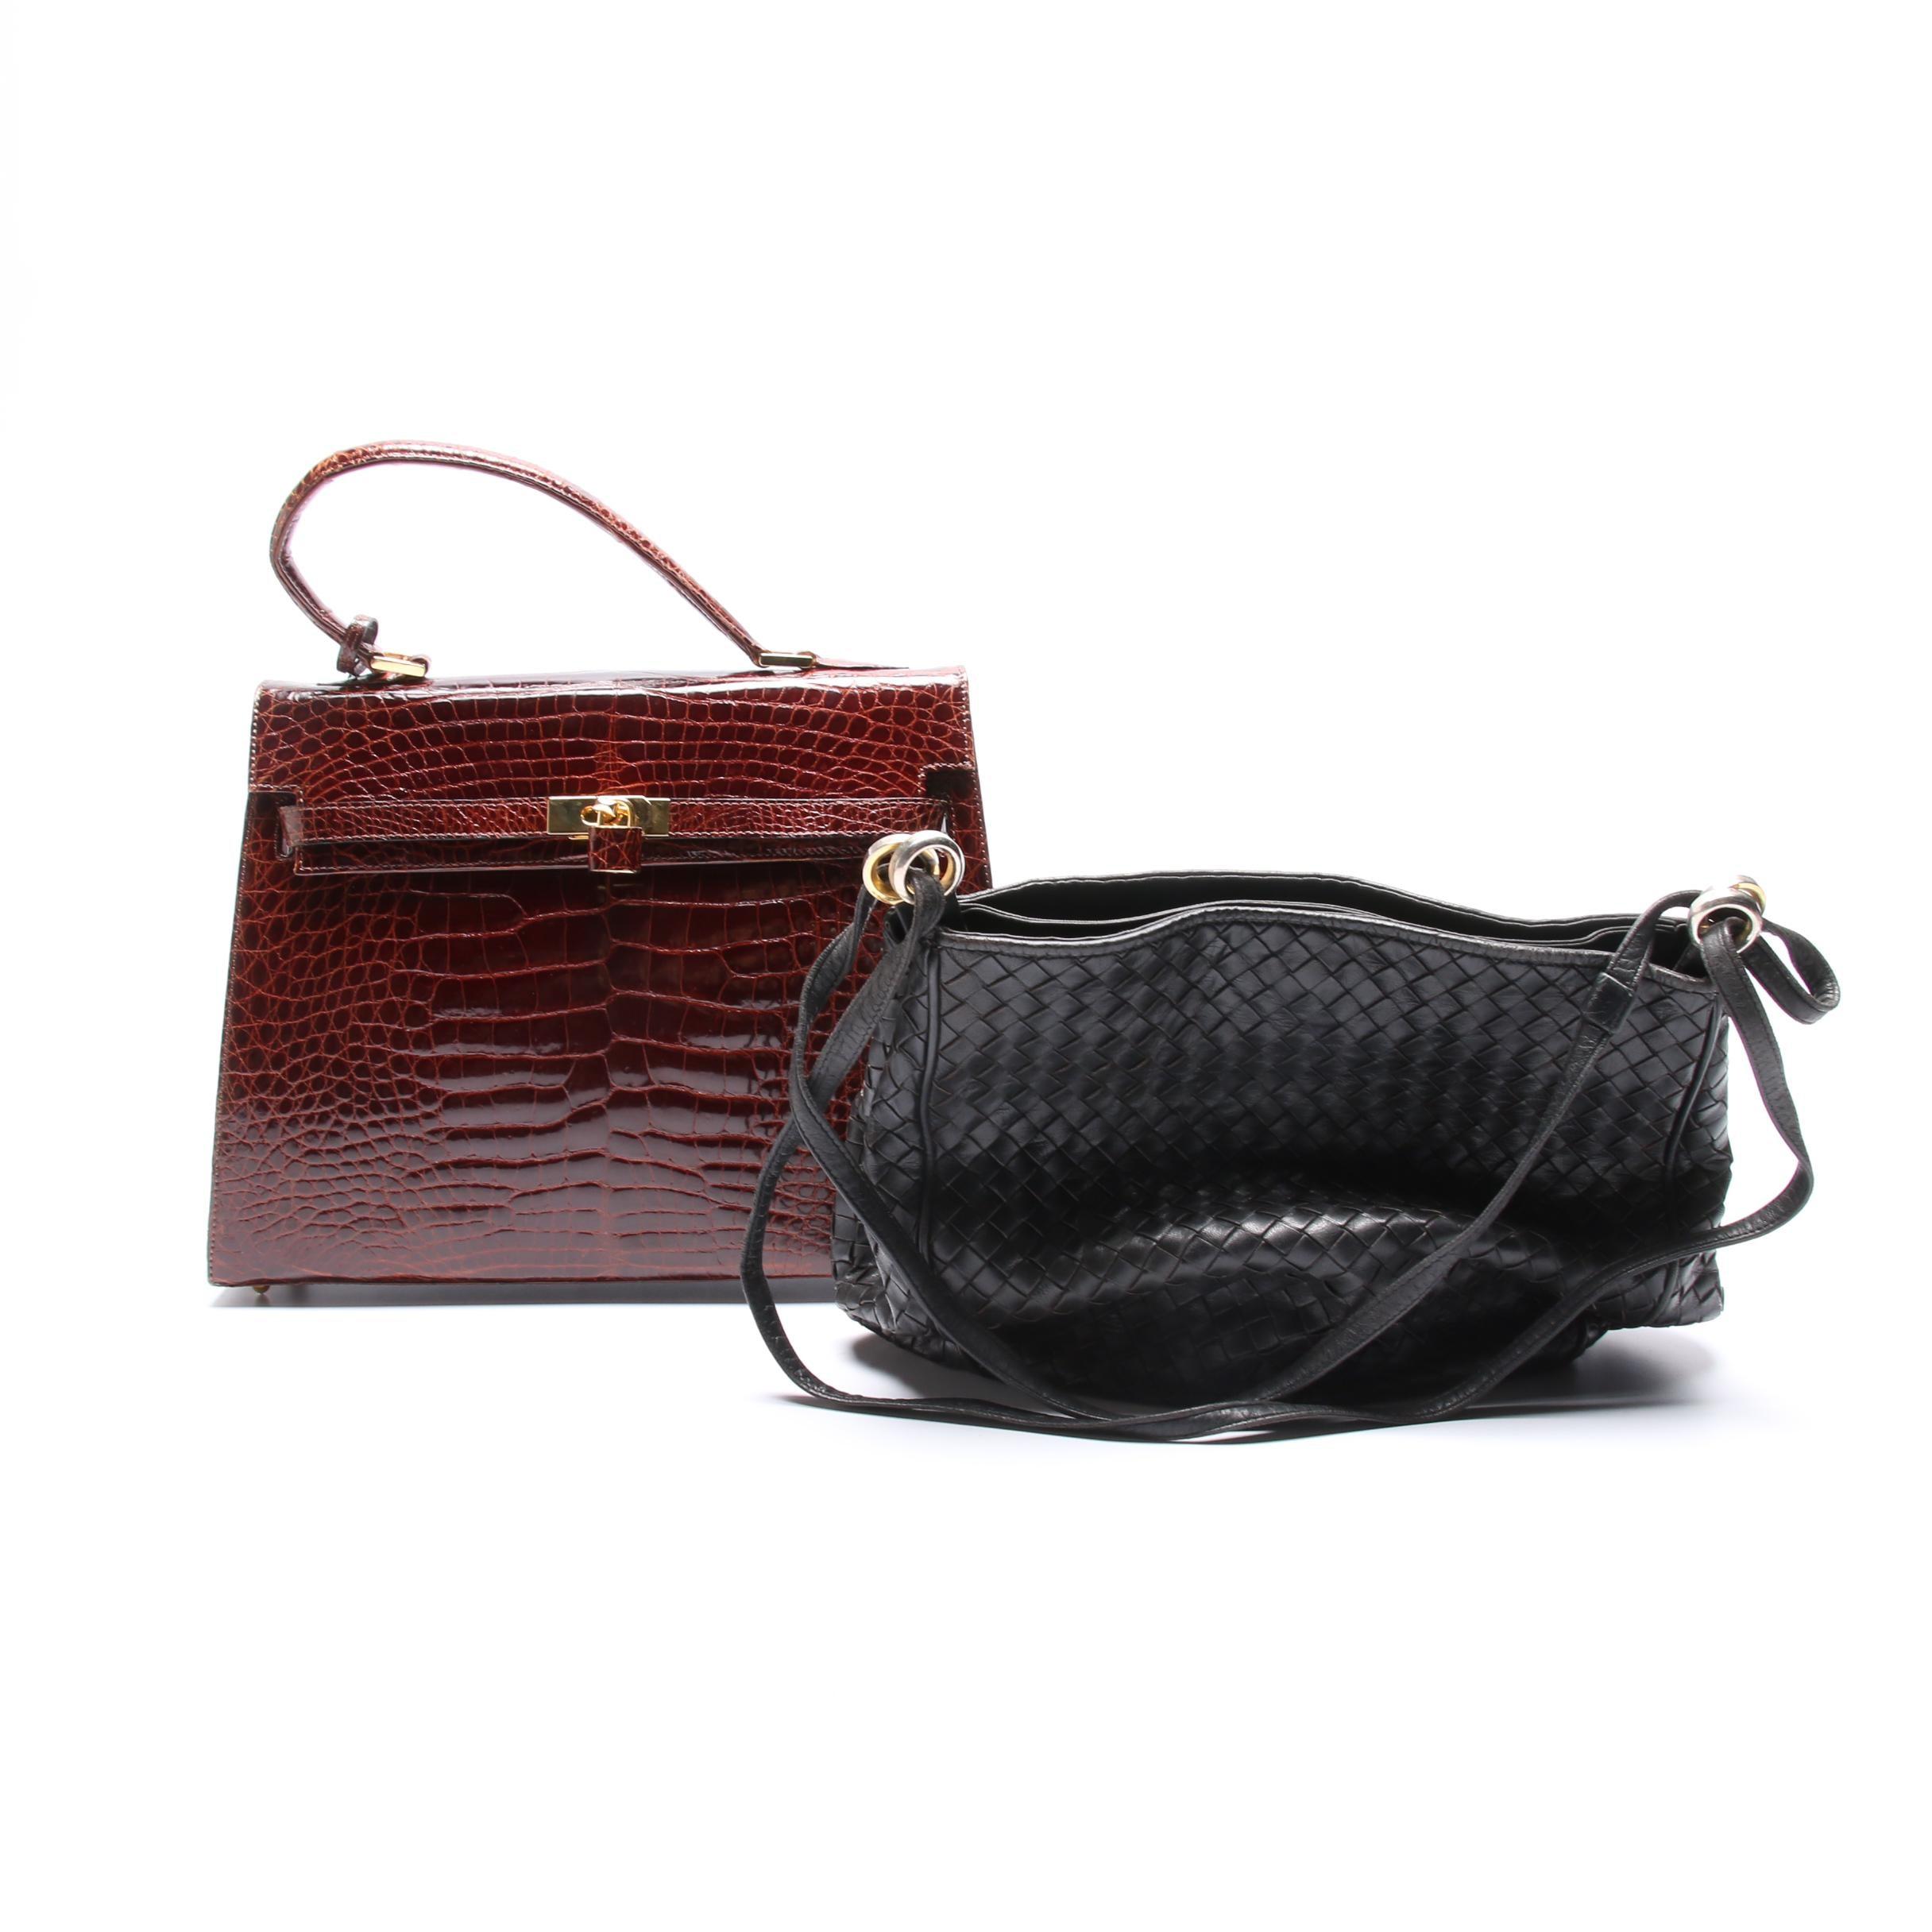 Siso Crocodile Skin Satchel and Woven Leather Handbag